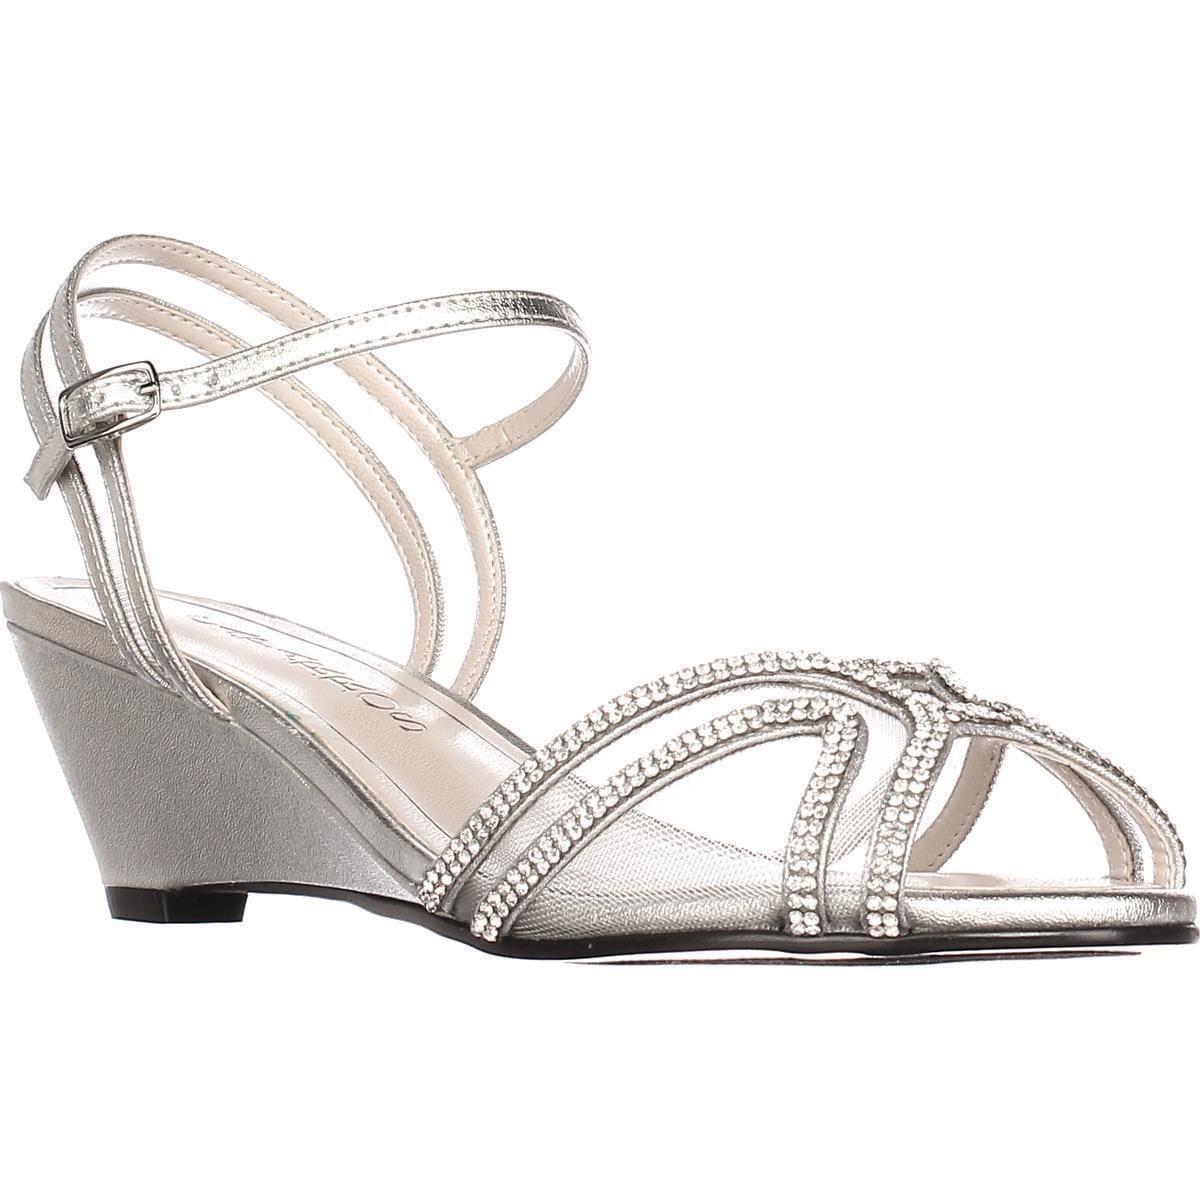 6a6742eedbd Shop Caparros Hilton Low-Heel Dress Wedge Sandals